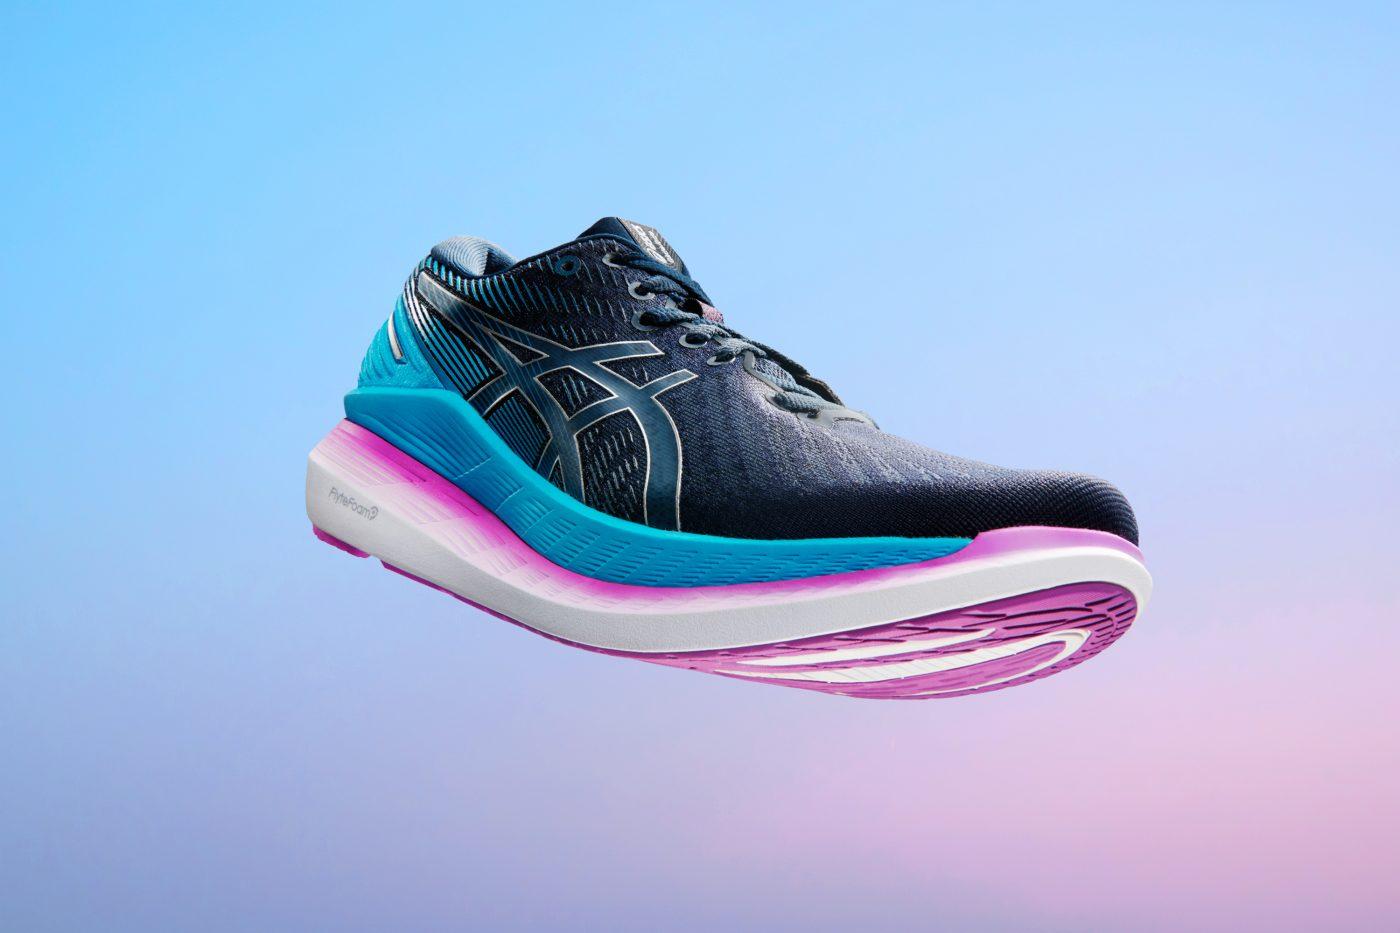 asics-glideride-2-femmes-running-runpack